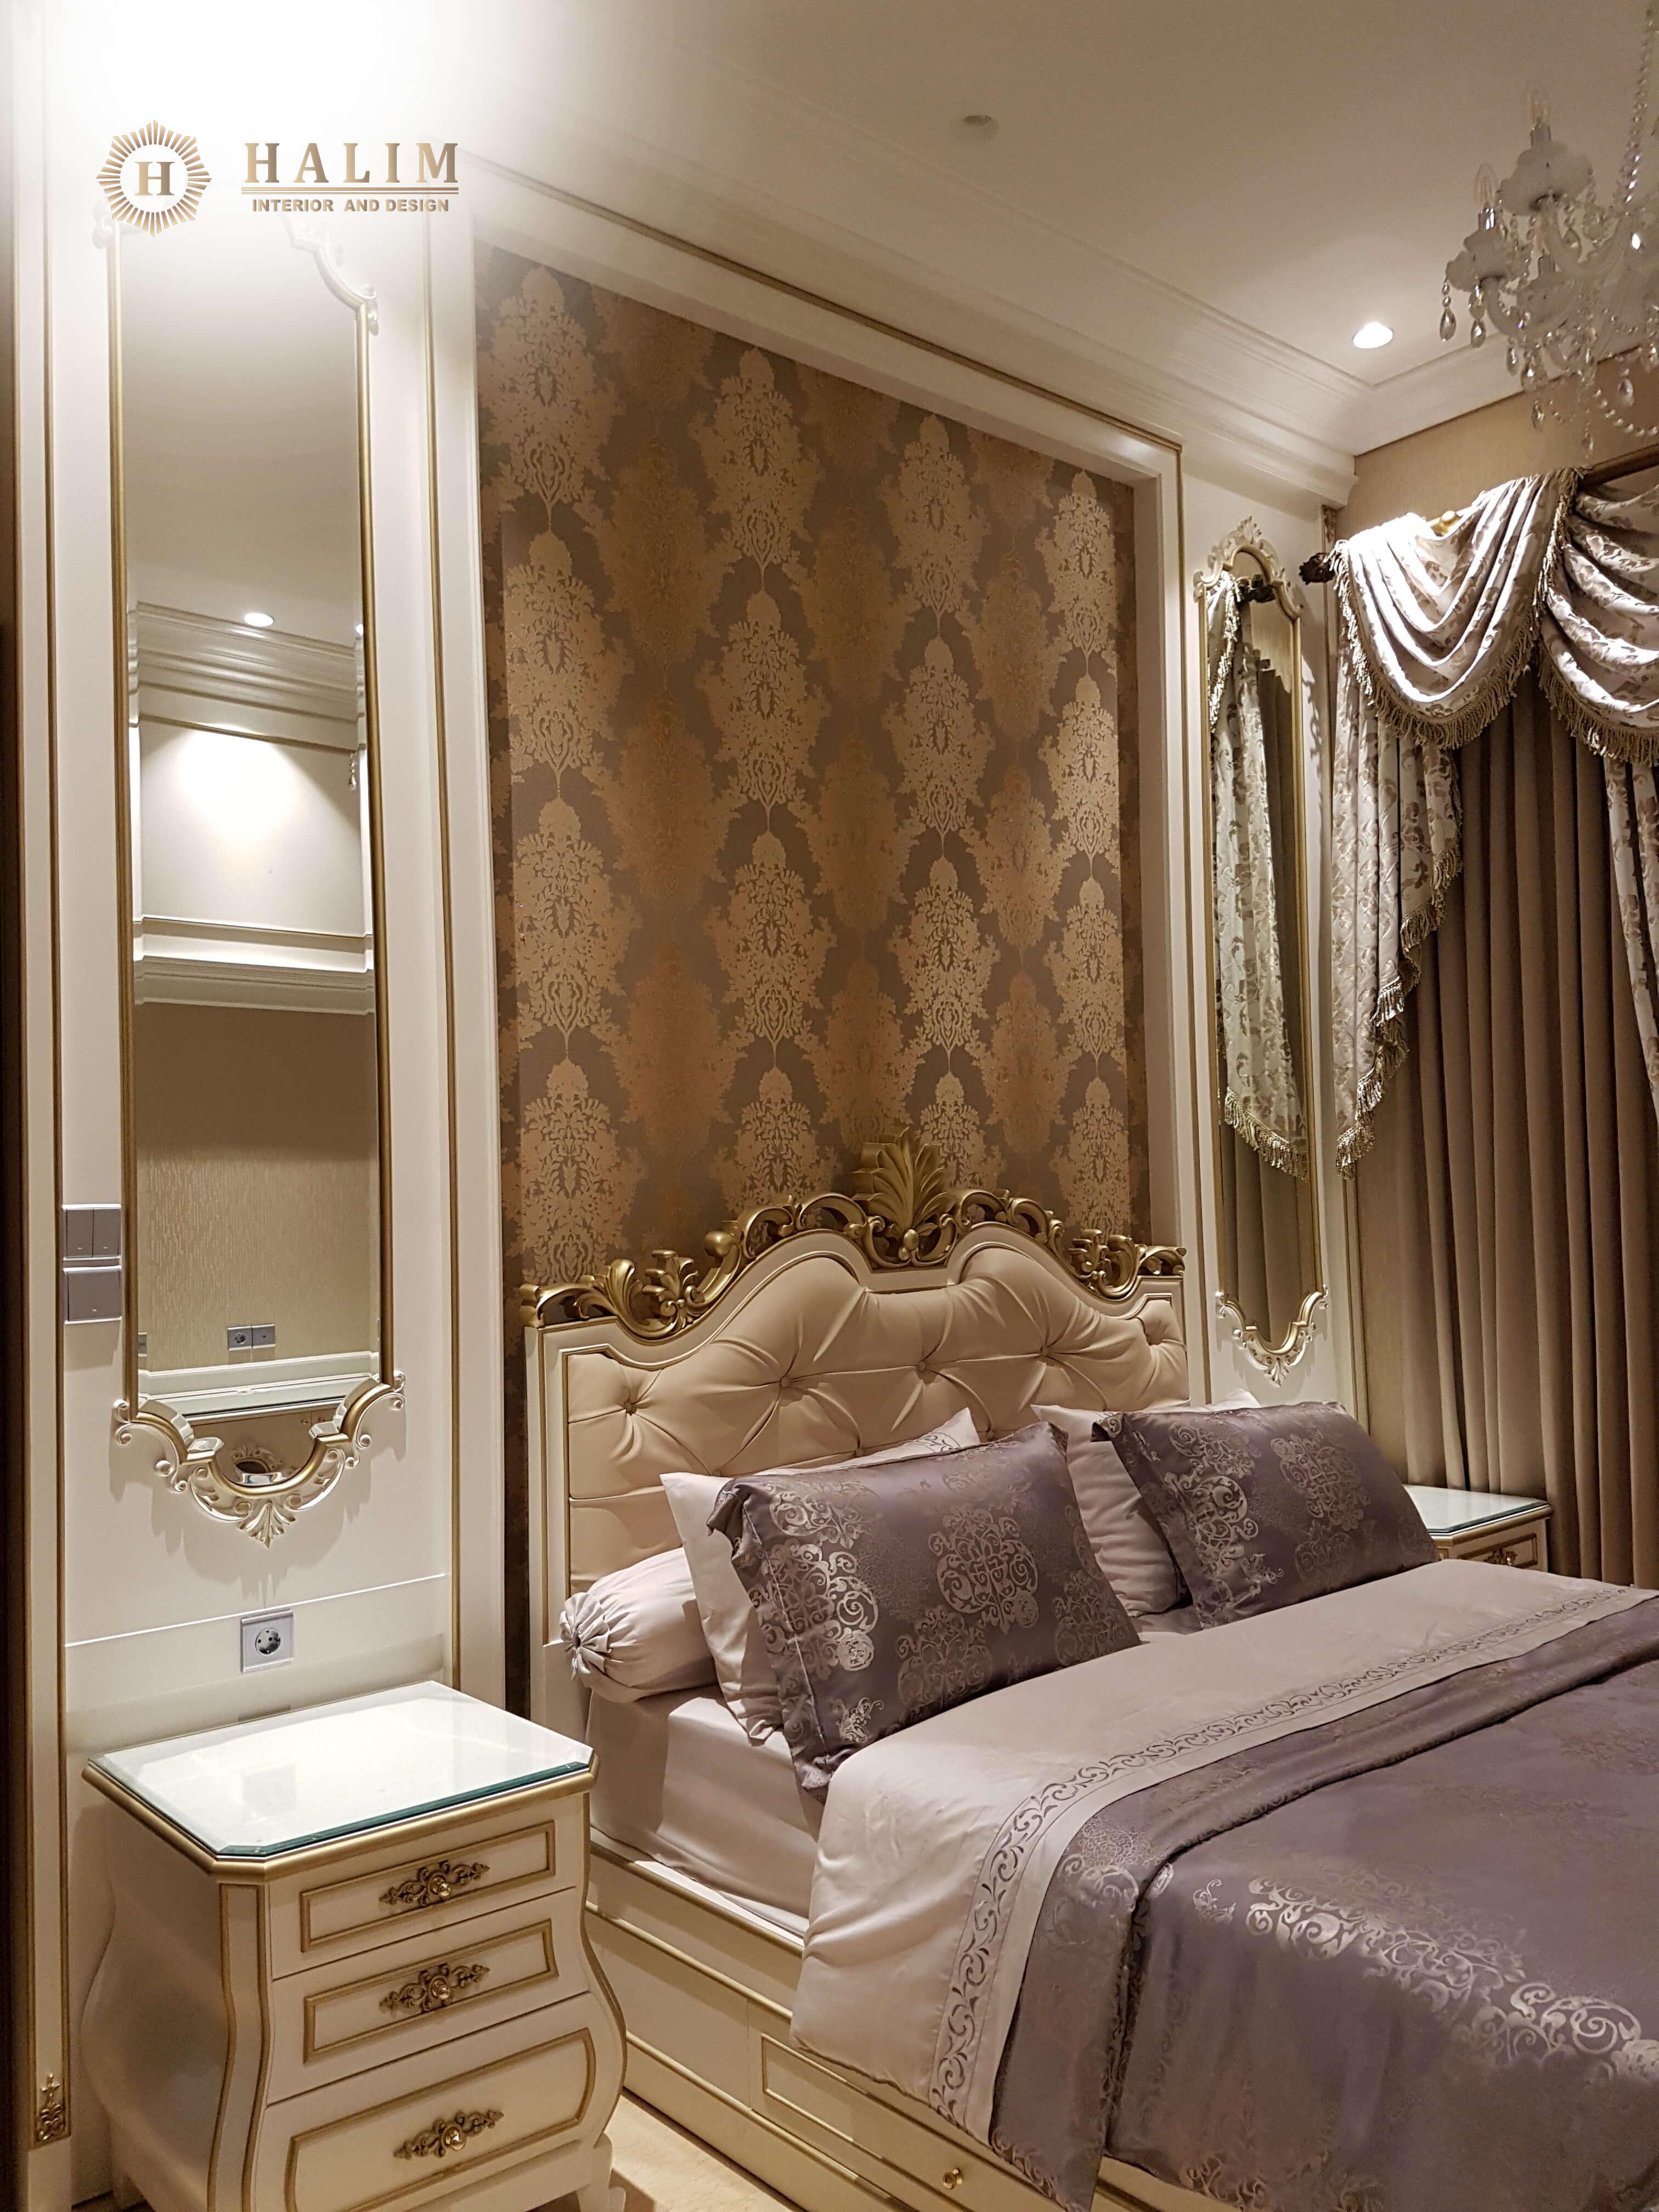 Halim, Interior, modern, furniture, contemporer american style, minimalist, european, classic, surabaya, Taman Hunian Satelit 9. Kamar tamu